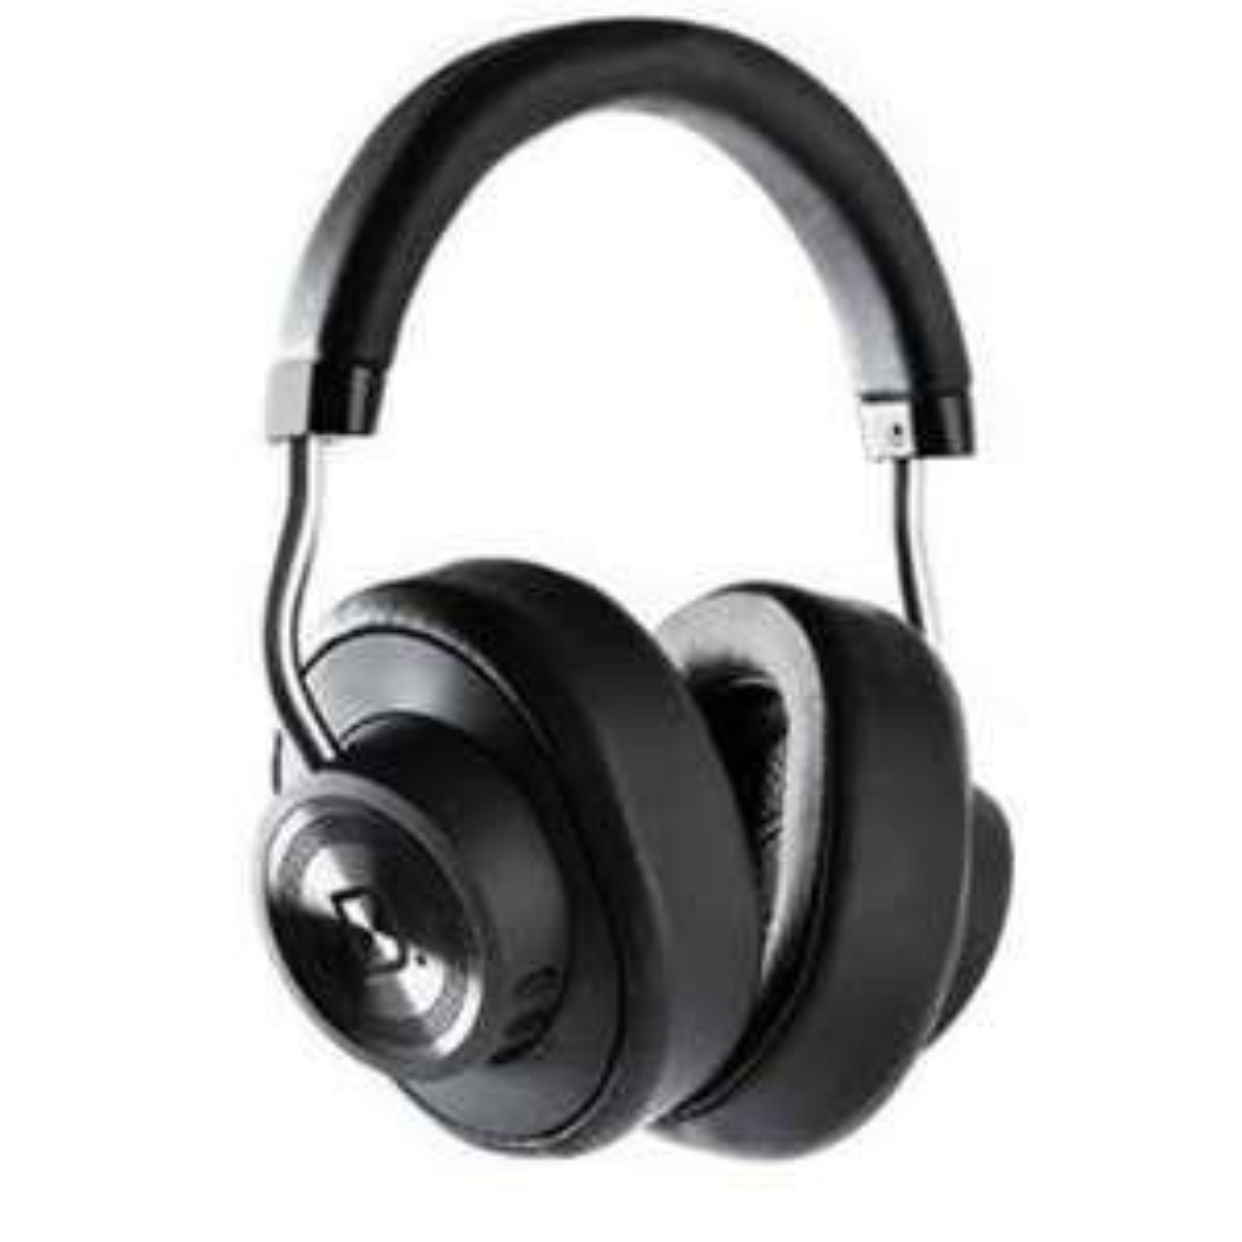 Definitive Technology SYMPHONY 1 für 219€ bei [amazon.de] Over-Ear Wireless-Kopfhörer mit Active Noise Cancelling schwarz